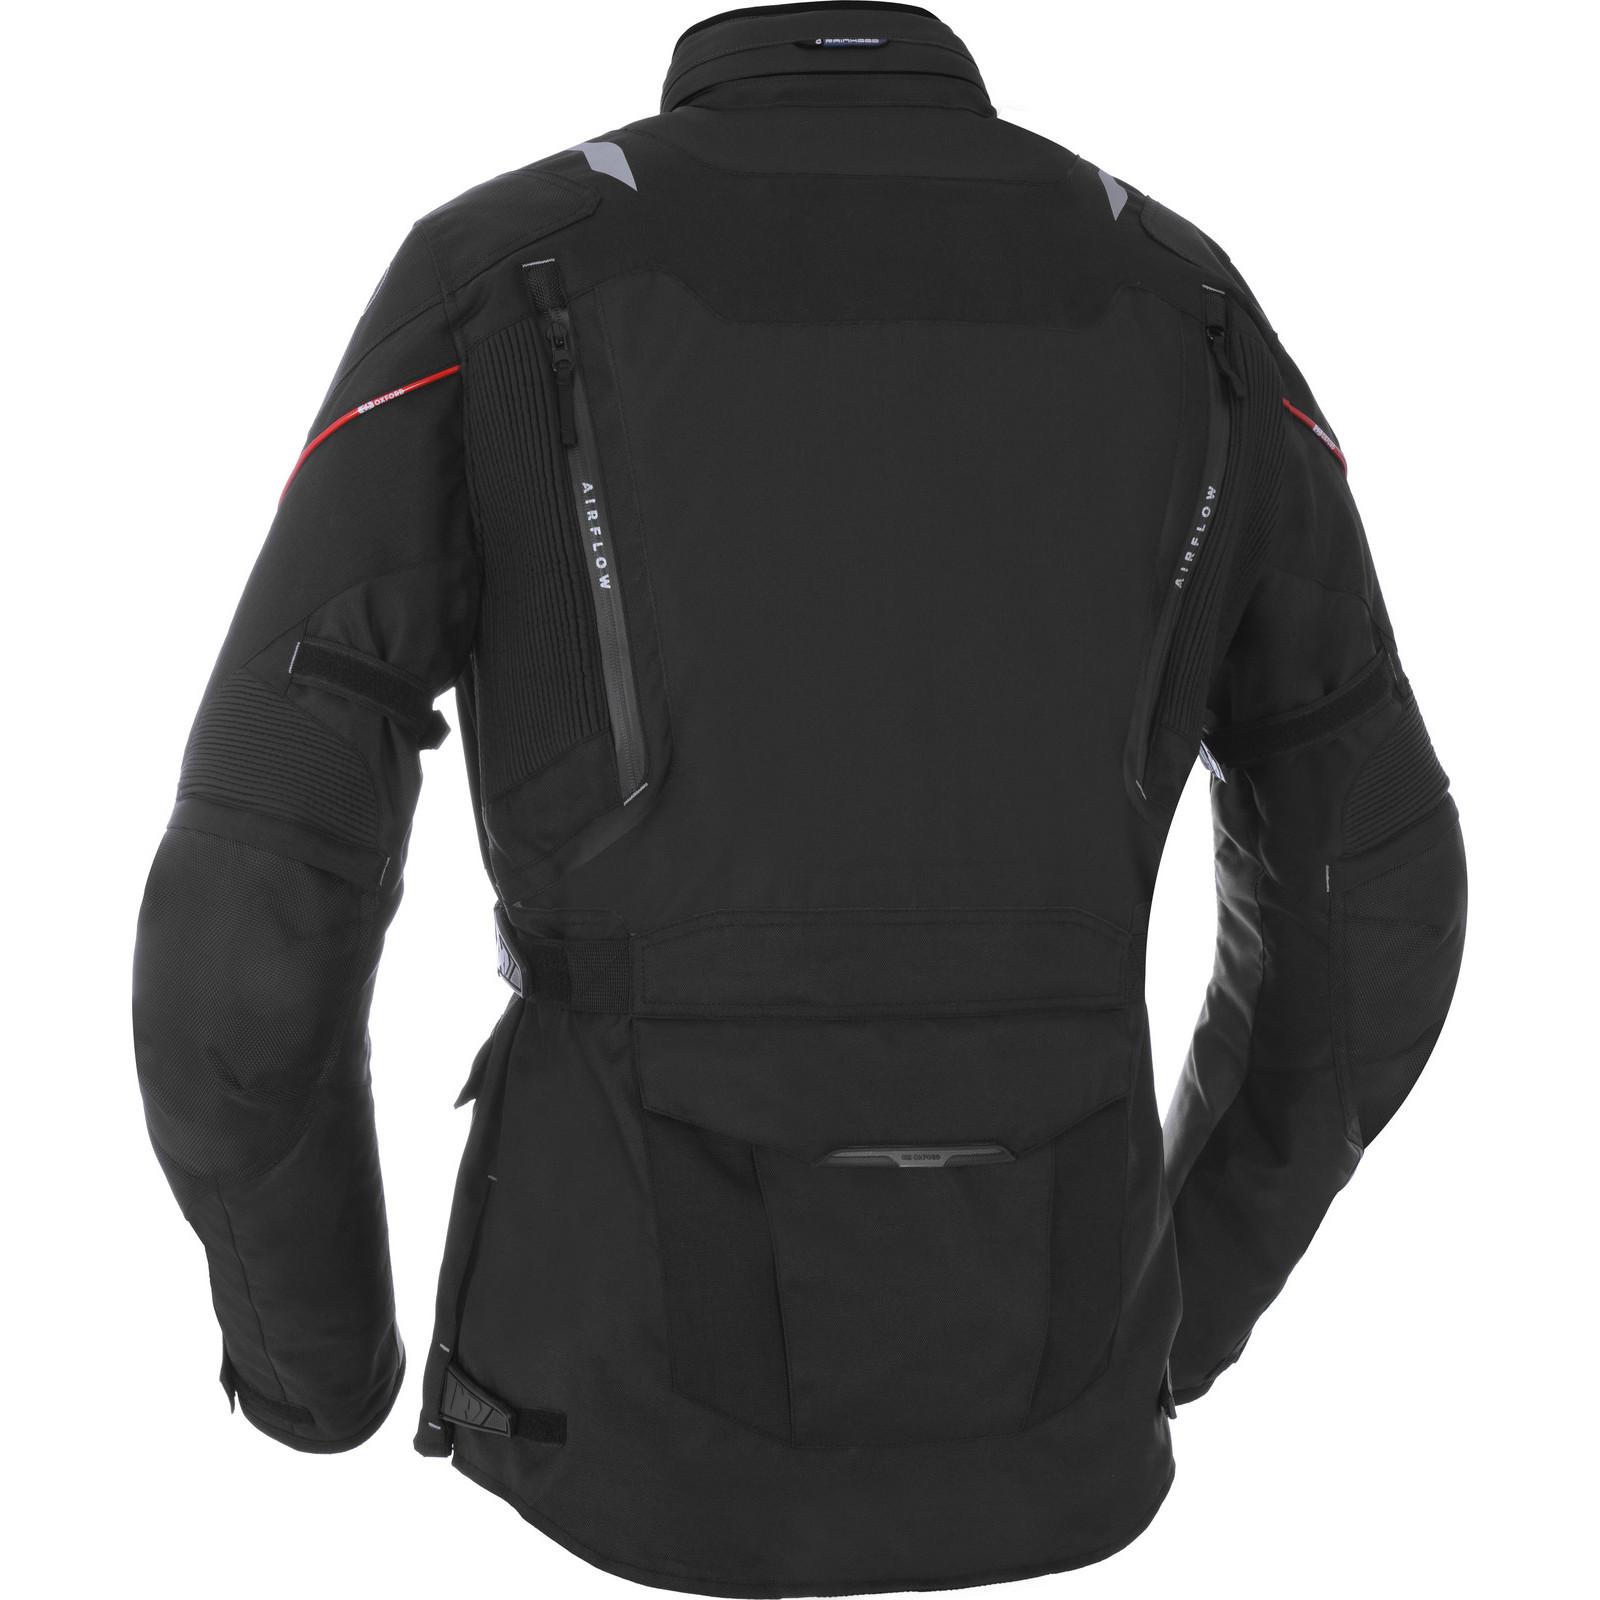 Oxford Montreal Motorcycle Jacket